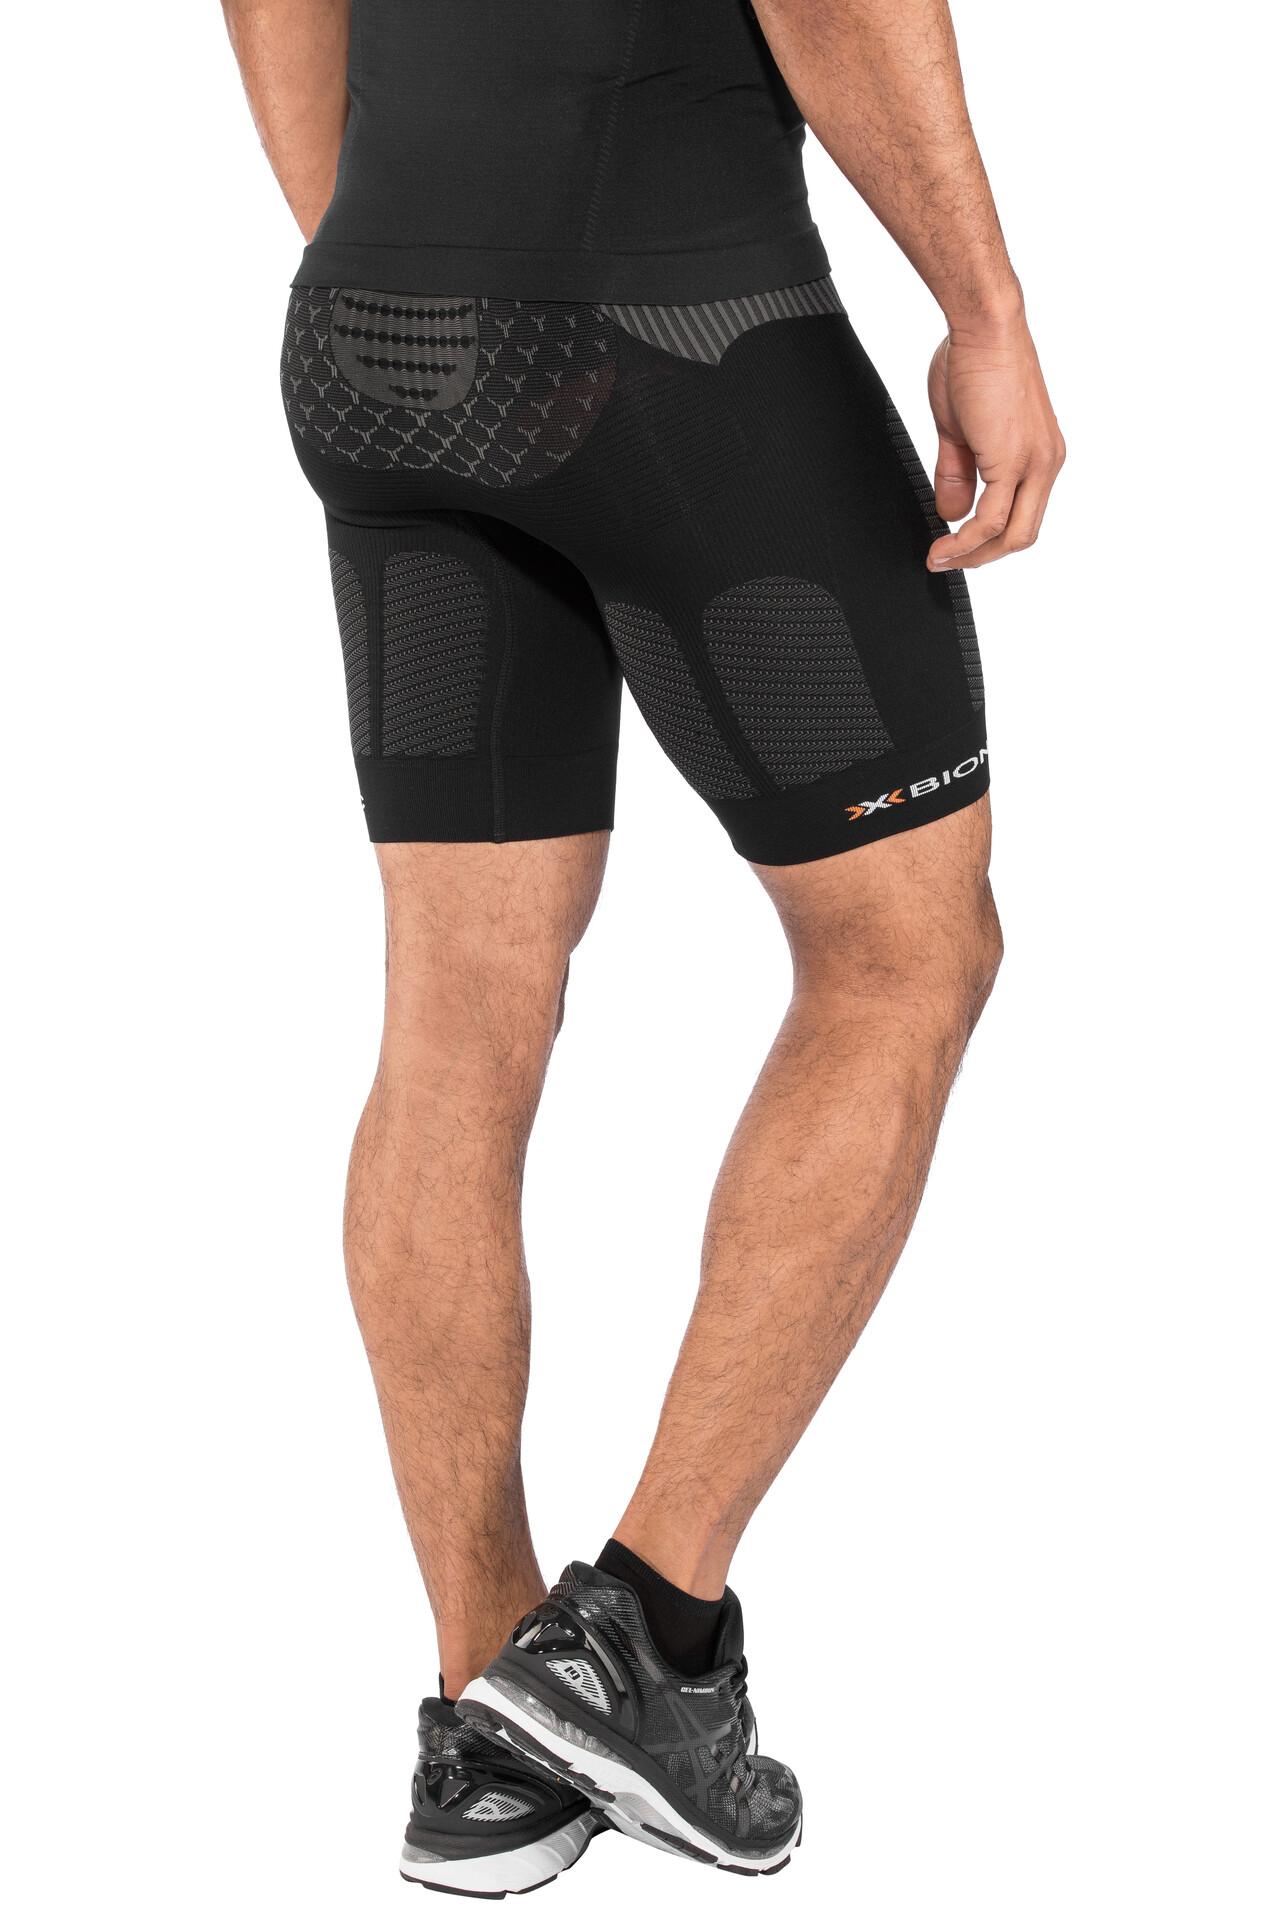 Ow Bionic Big Pantalones Running Pocket HombreBlackanthracite Twyce Cortos X UpGLqzSMV